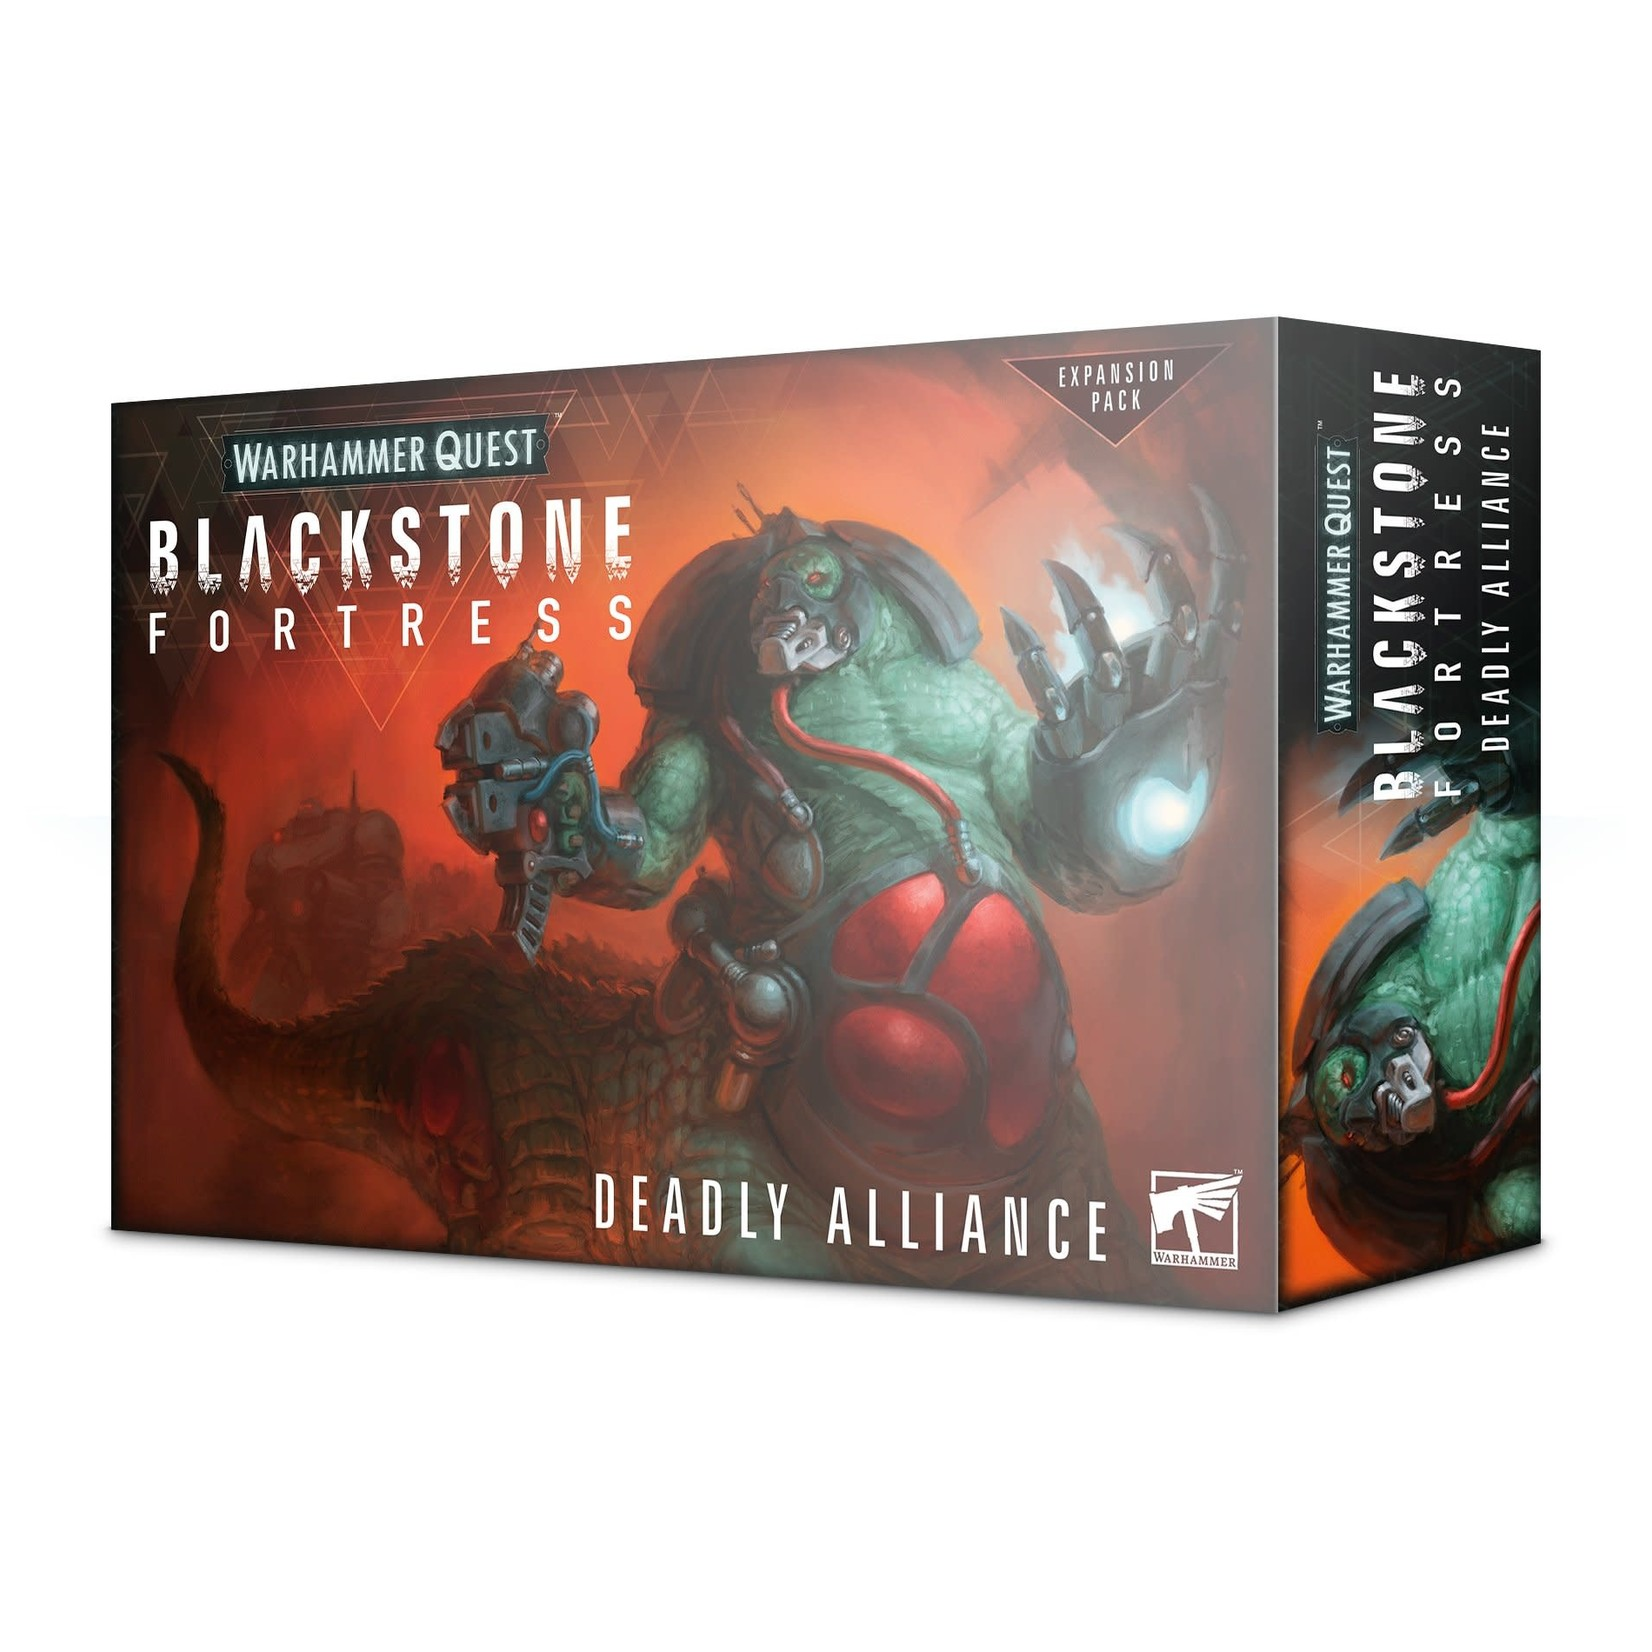 Games Workshop Blackstone Fortress Deadly Alliance